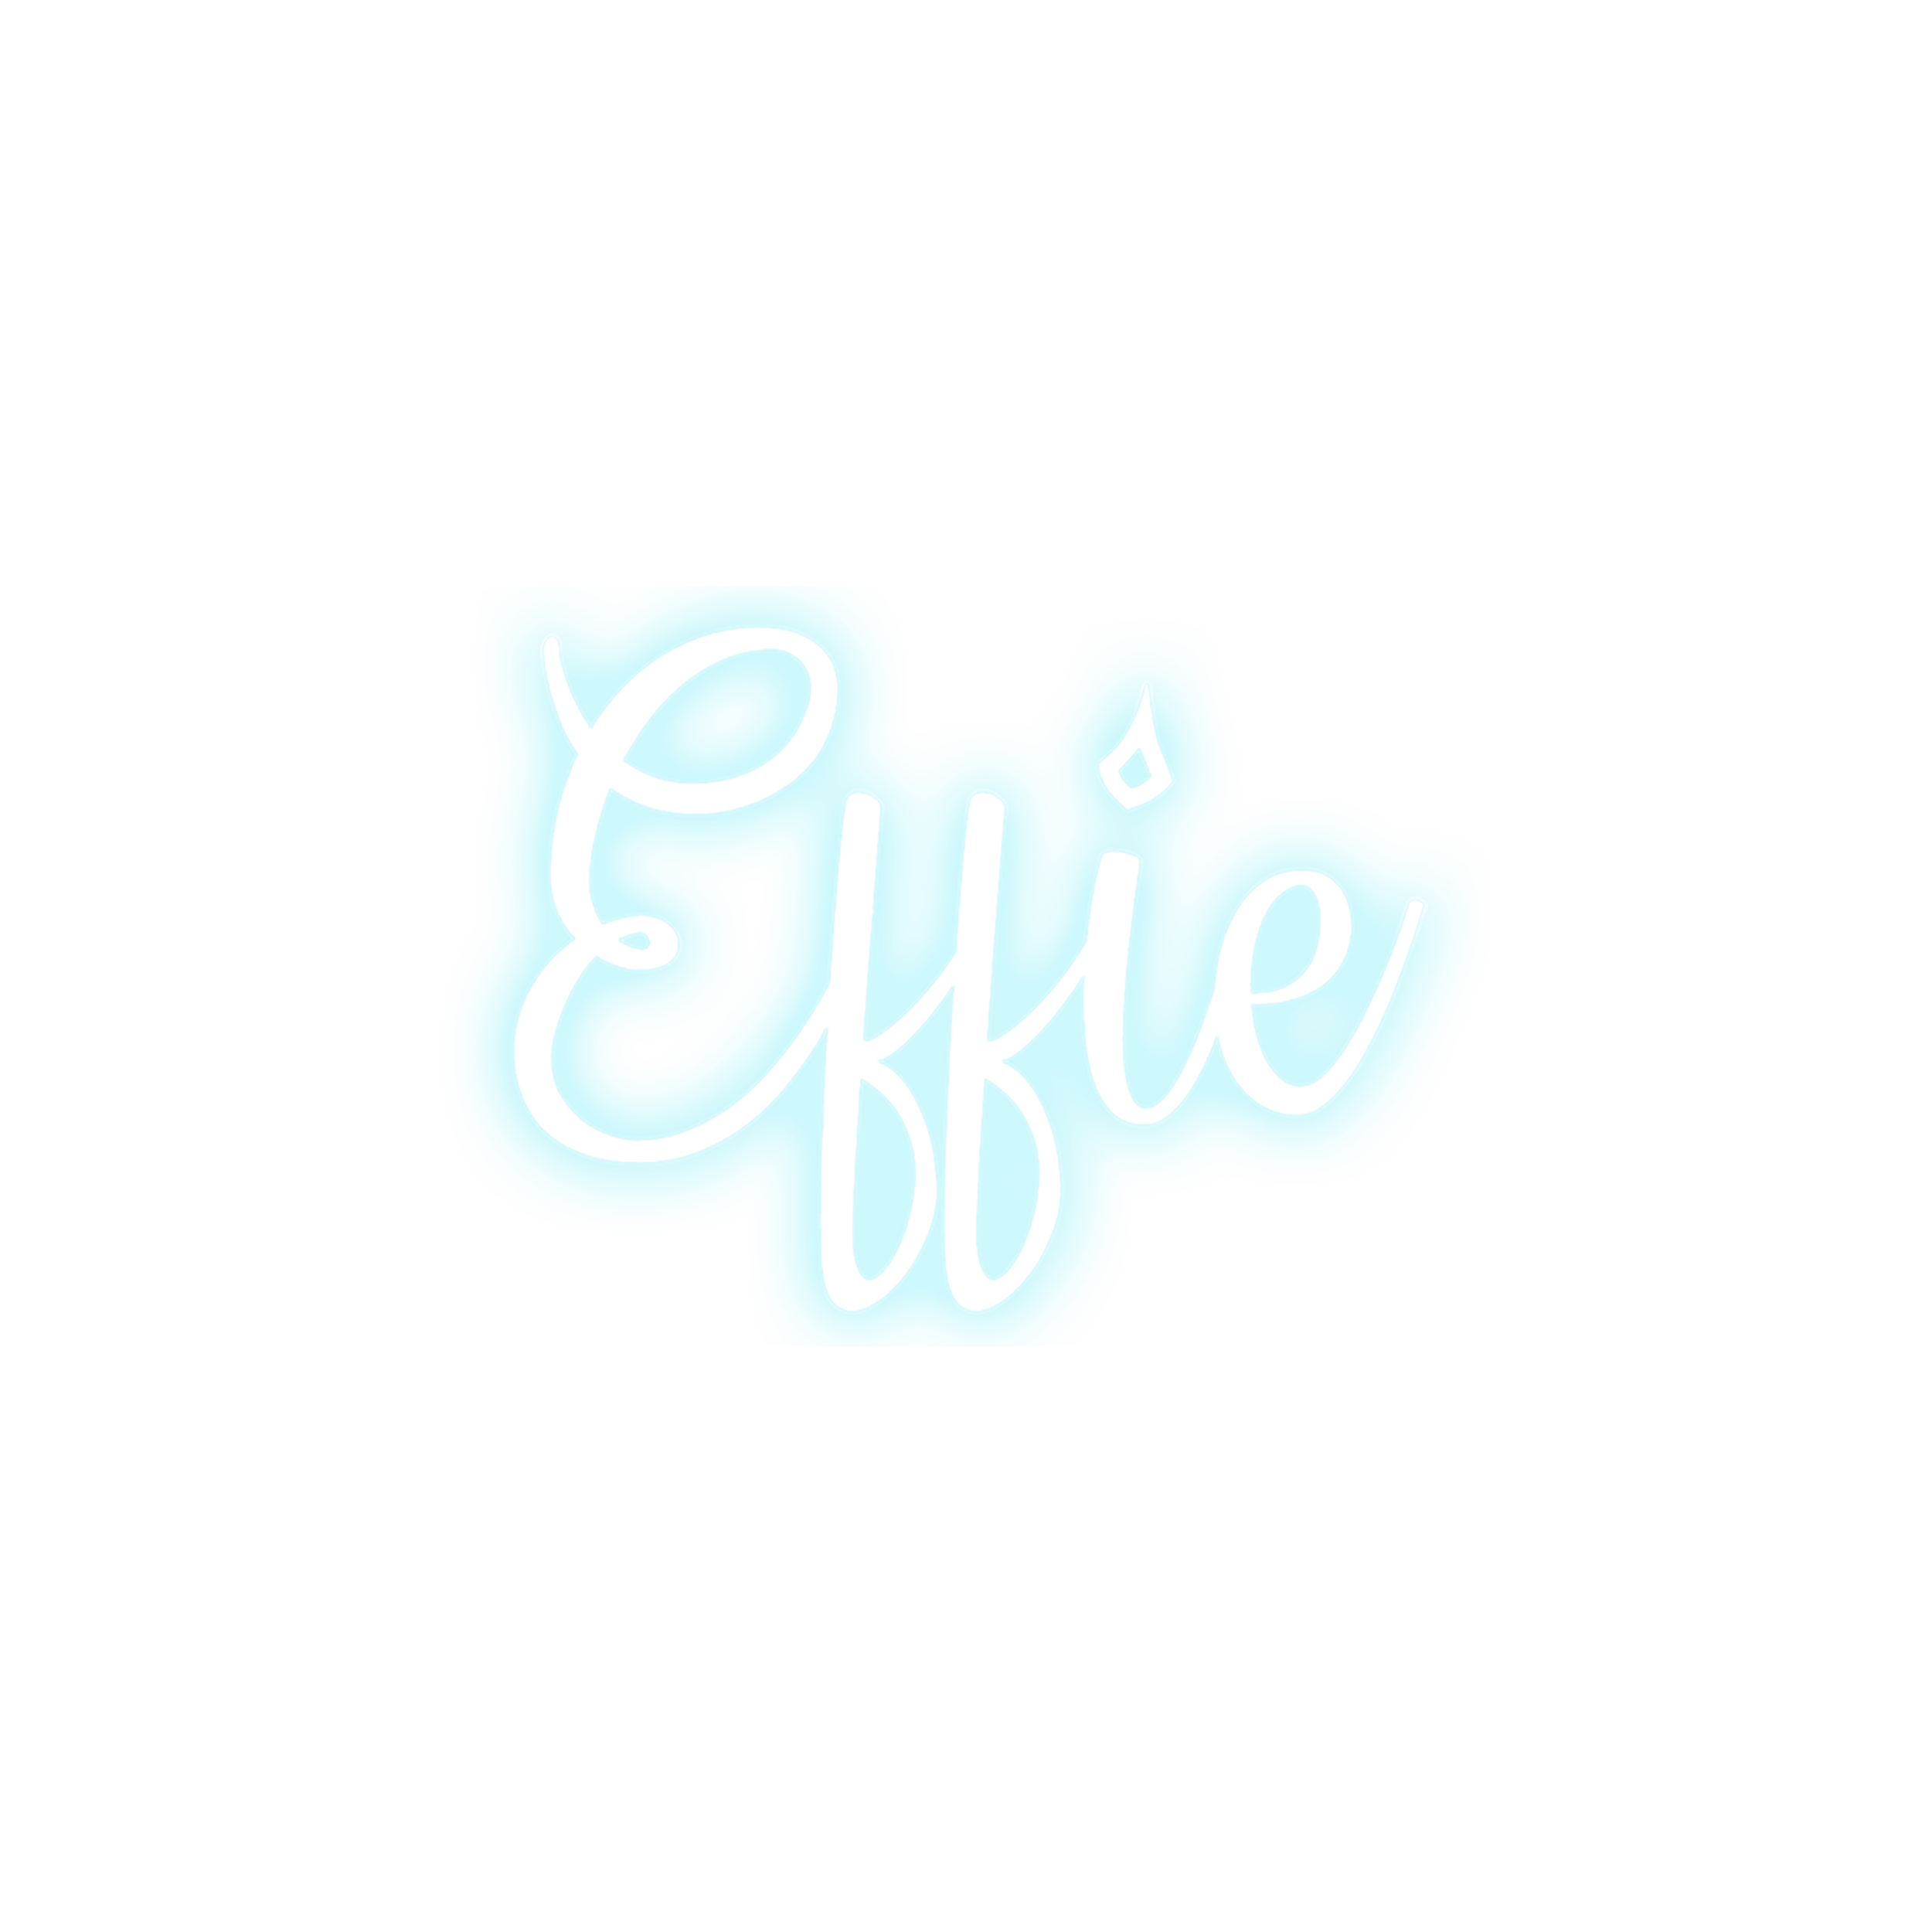 Effie logo